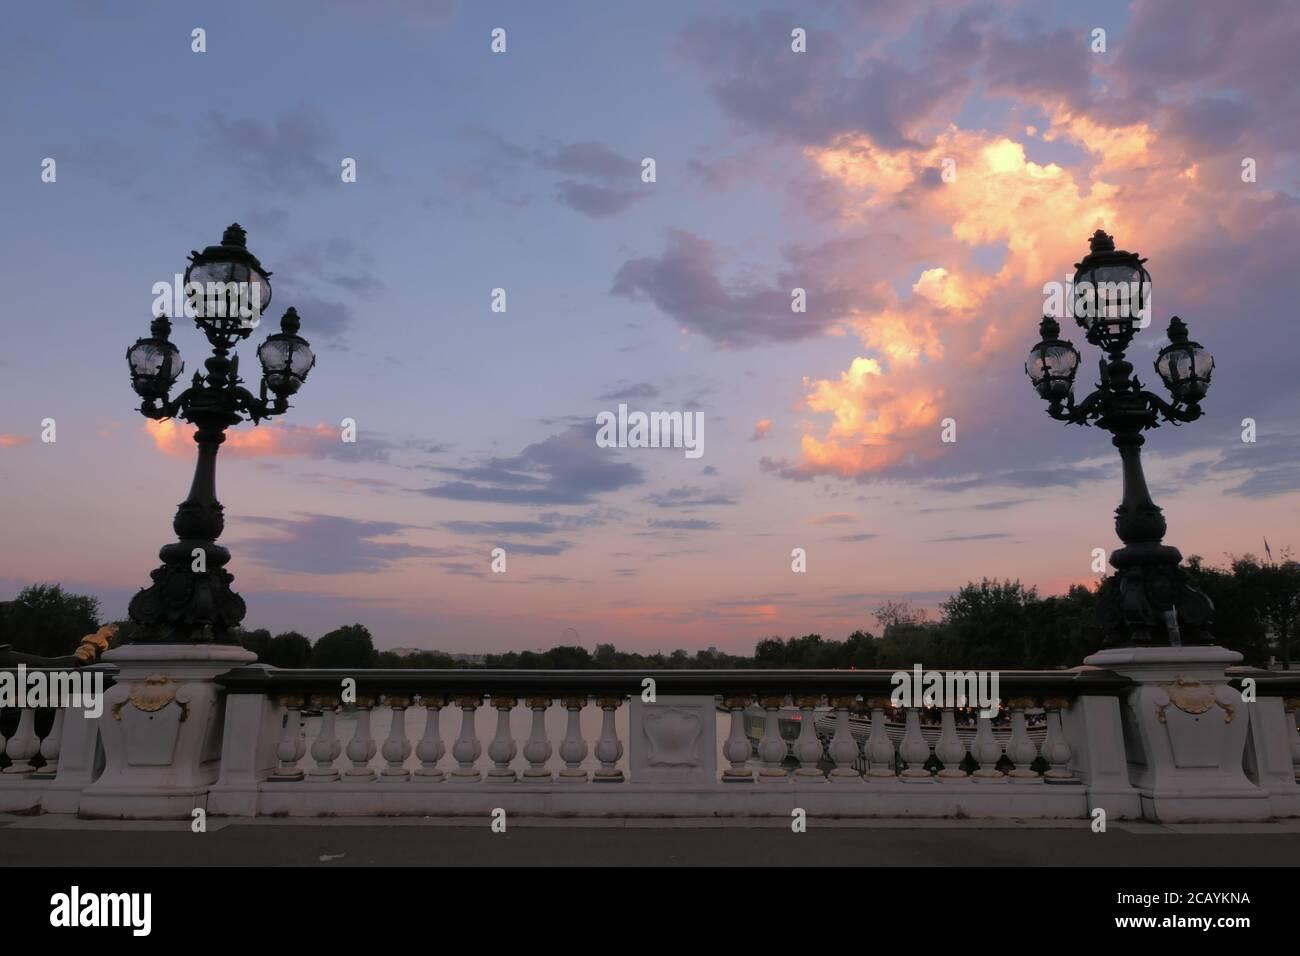 Paris, France. August 08. 2020. Sunset on the famous Alexander 3 Bridge. Historic retro-style lampposts. Very touristy place. Stock Photo